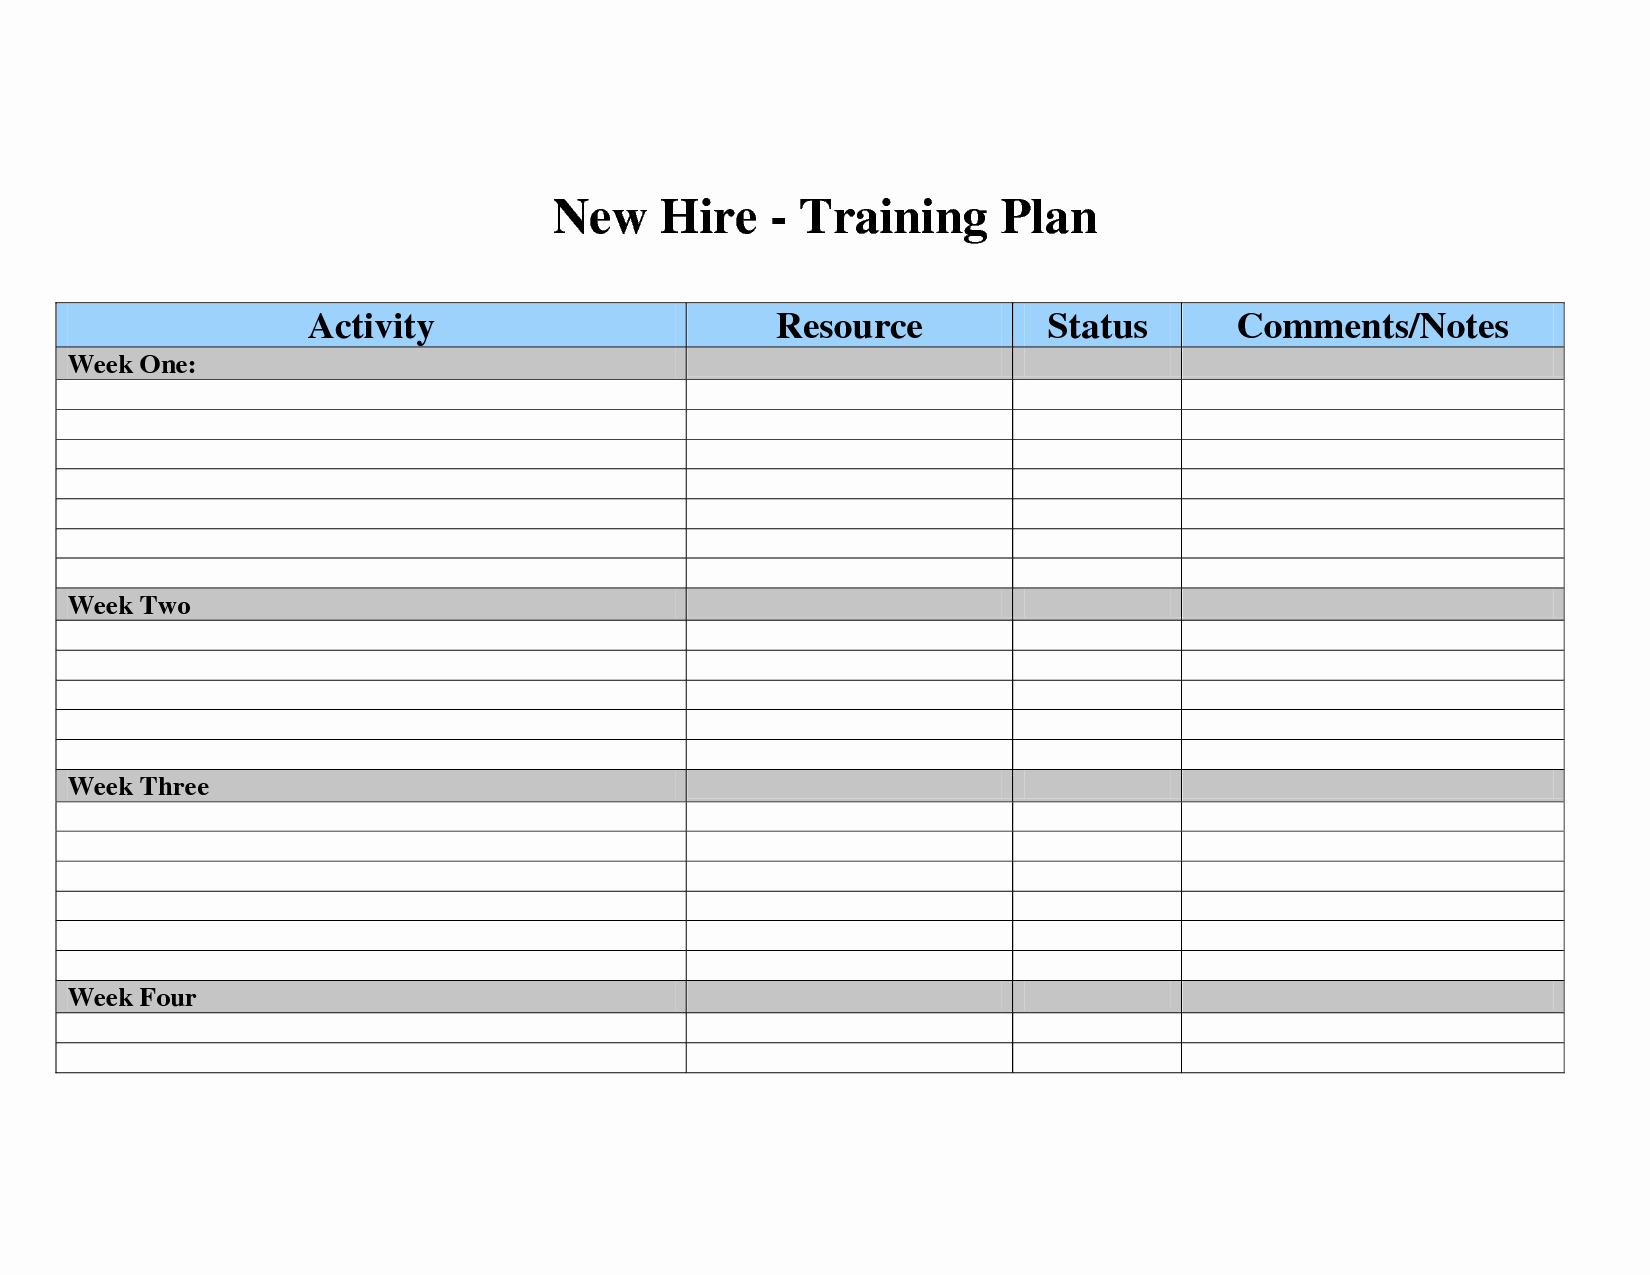 New Employee Training Plan Template Inspirational Employee Training Plan Template